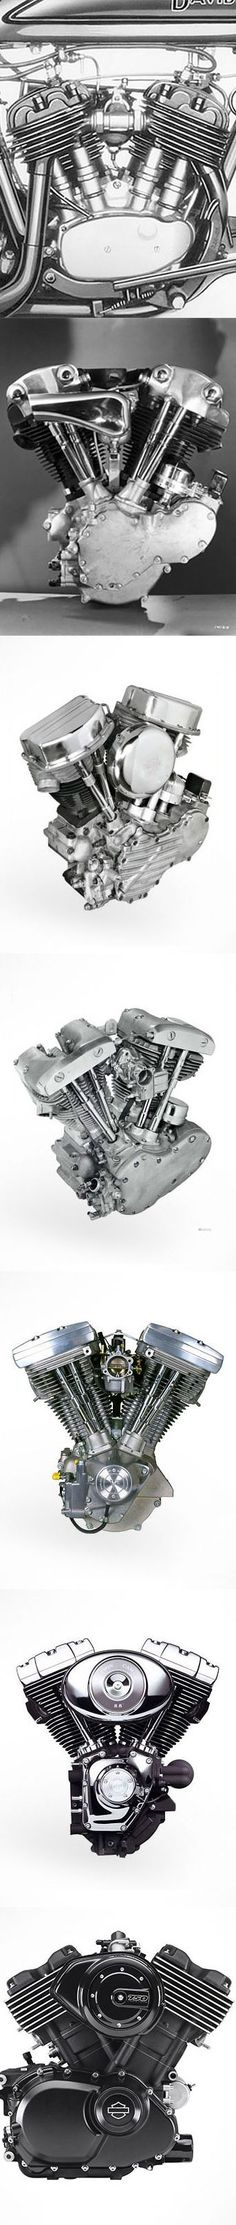 Check out the history of the Harley-Davidson engine. | Harley-Davidosn #DarkCustom